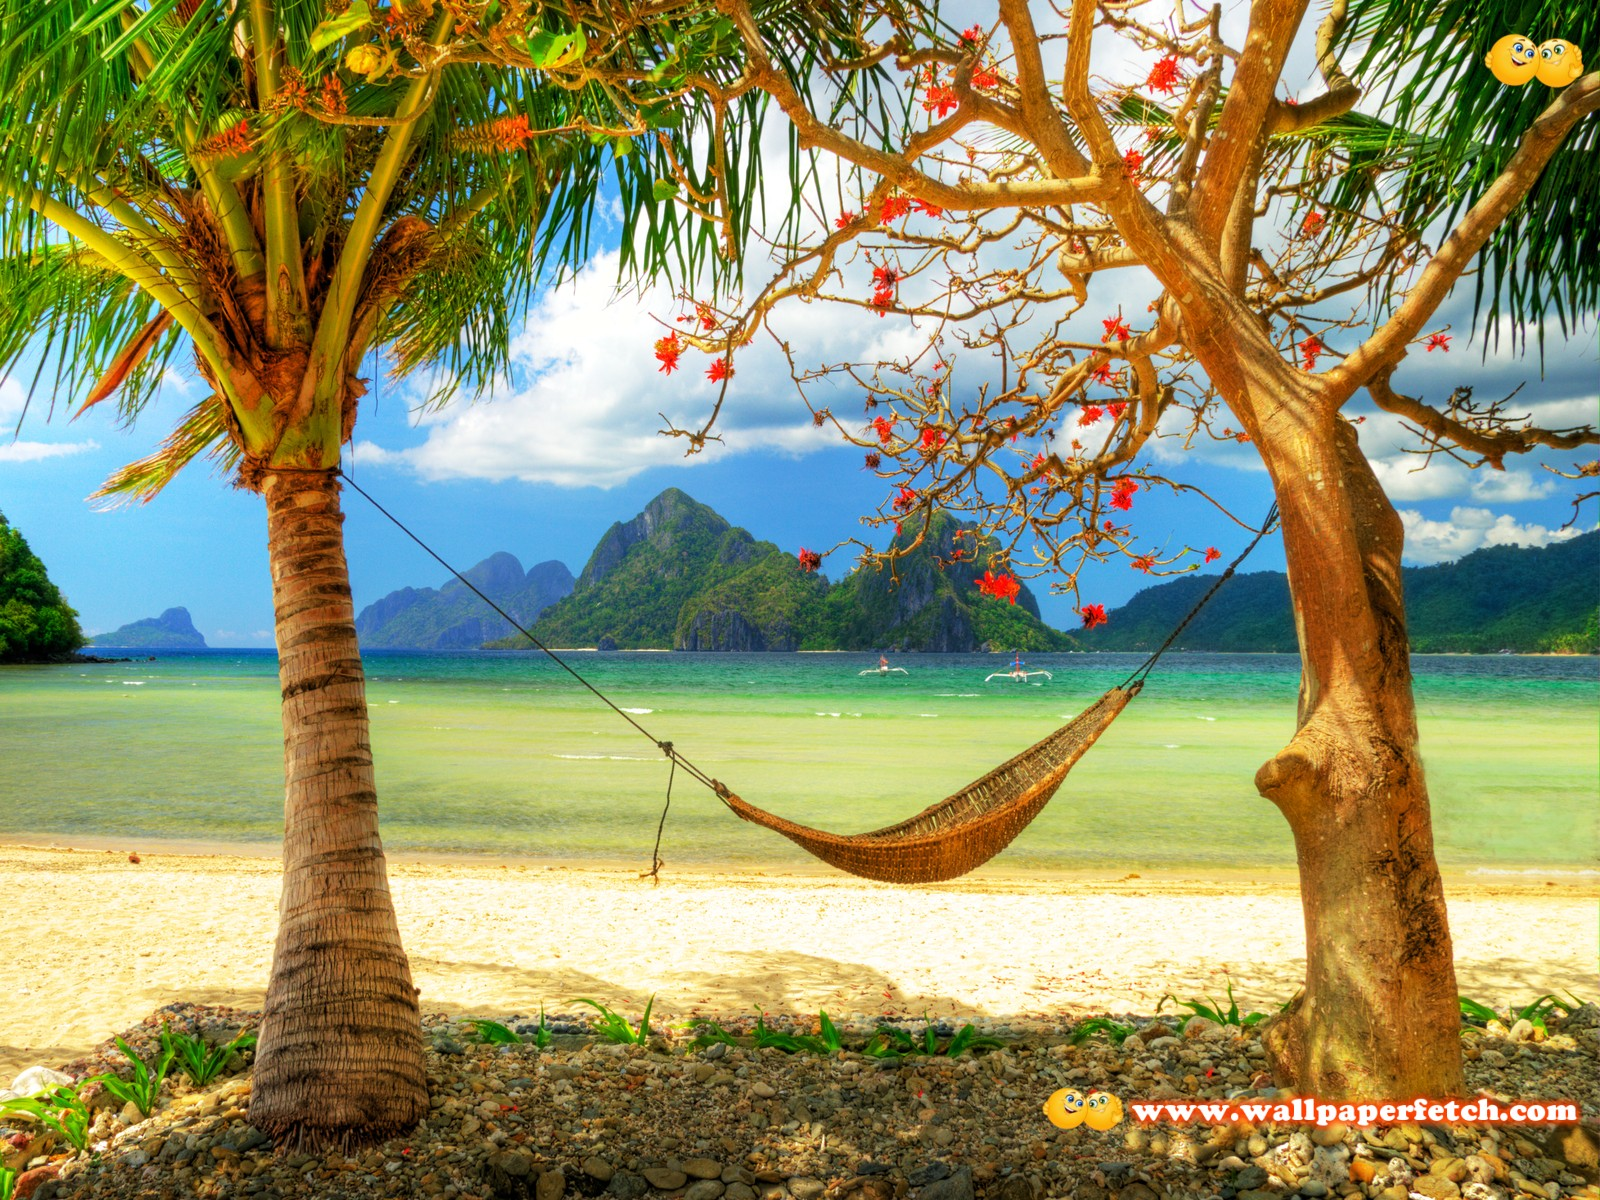 http://3.bp.blogspot.com/-ivh-cACqJ-c/Tr7qQeEhVwI/AAAAAAAAKf4/R97KErIiaIA/s1600/SuperPack_Beautiful_Nature_HD_Wallpapers_Part__80.194.jpg